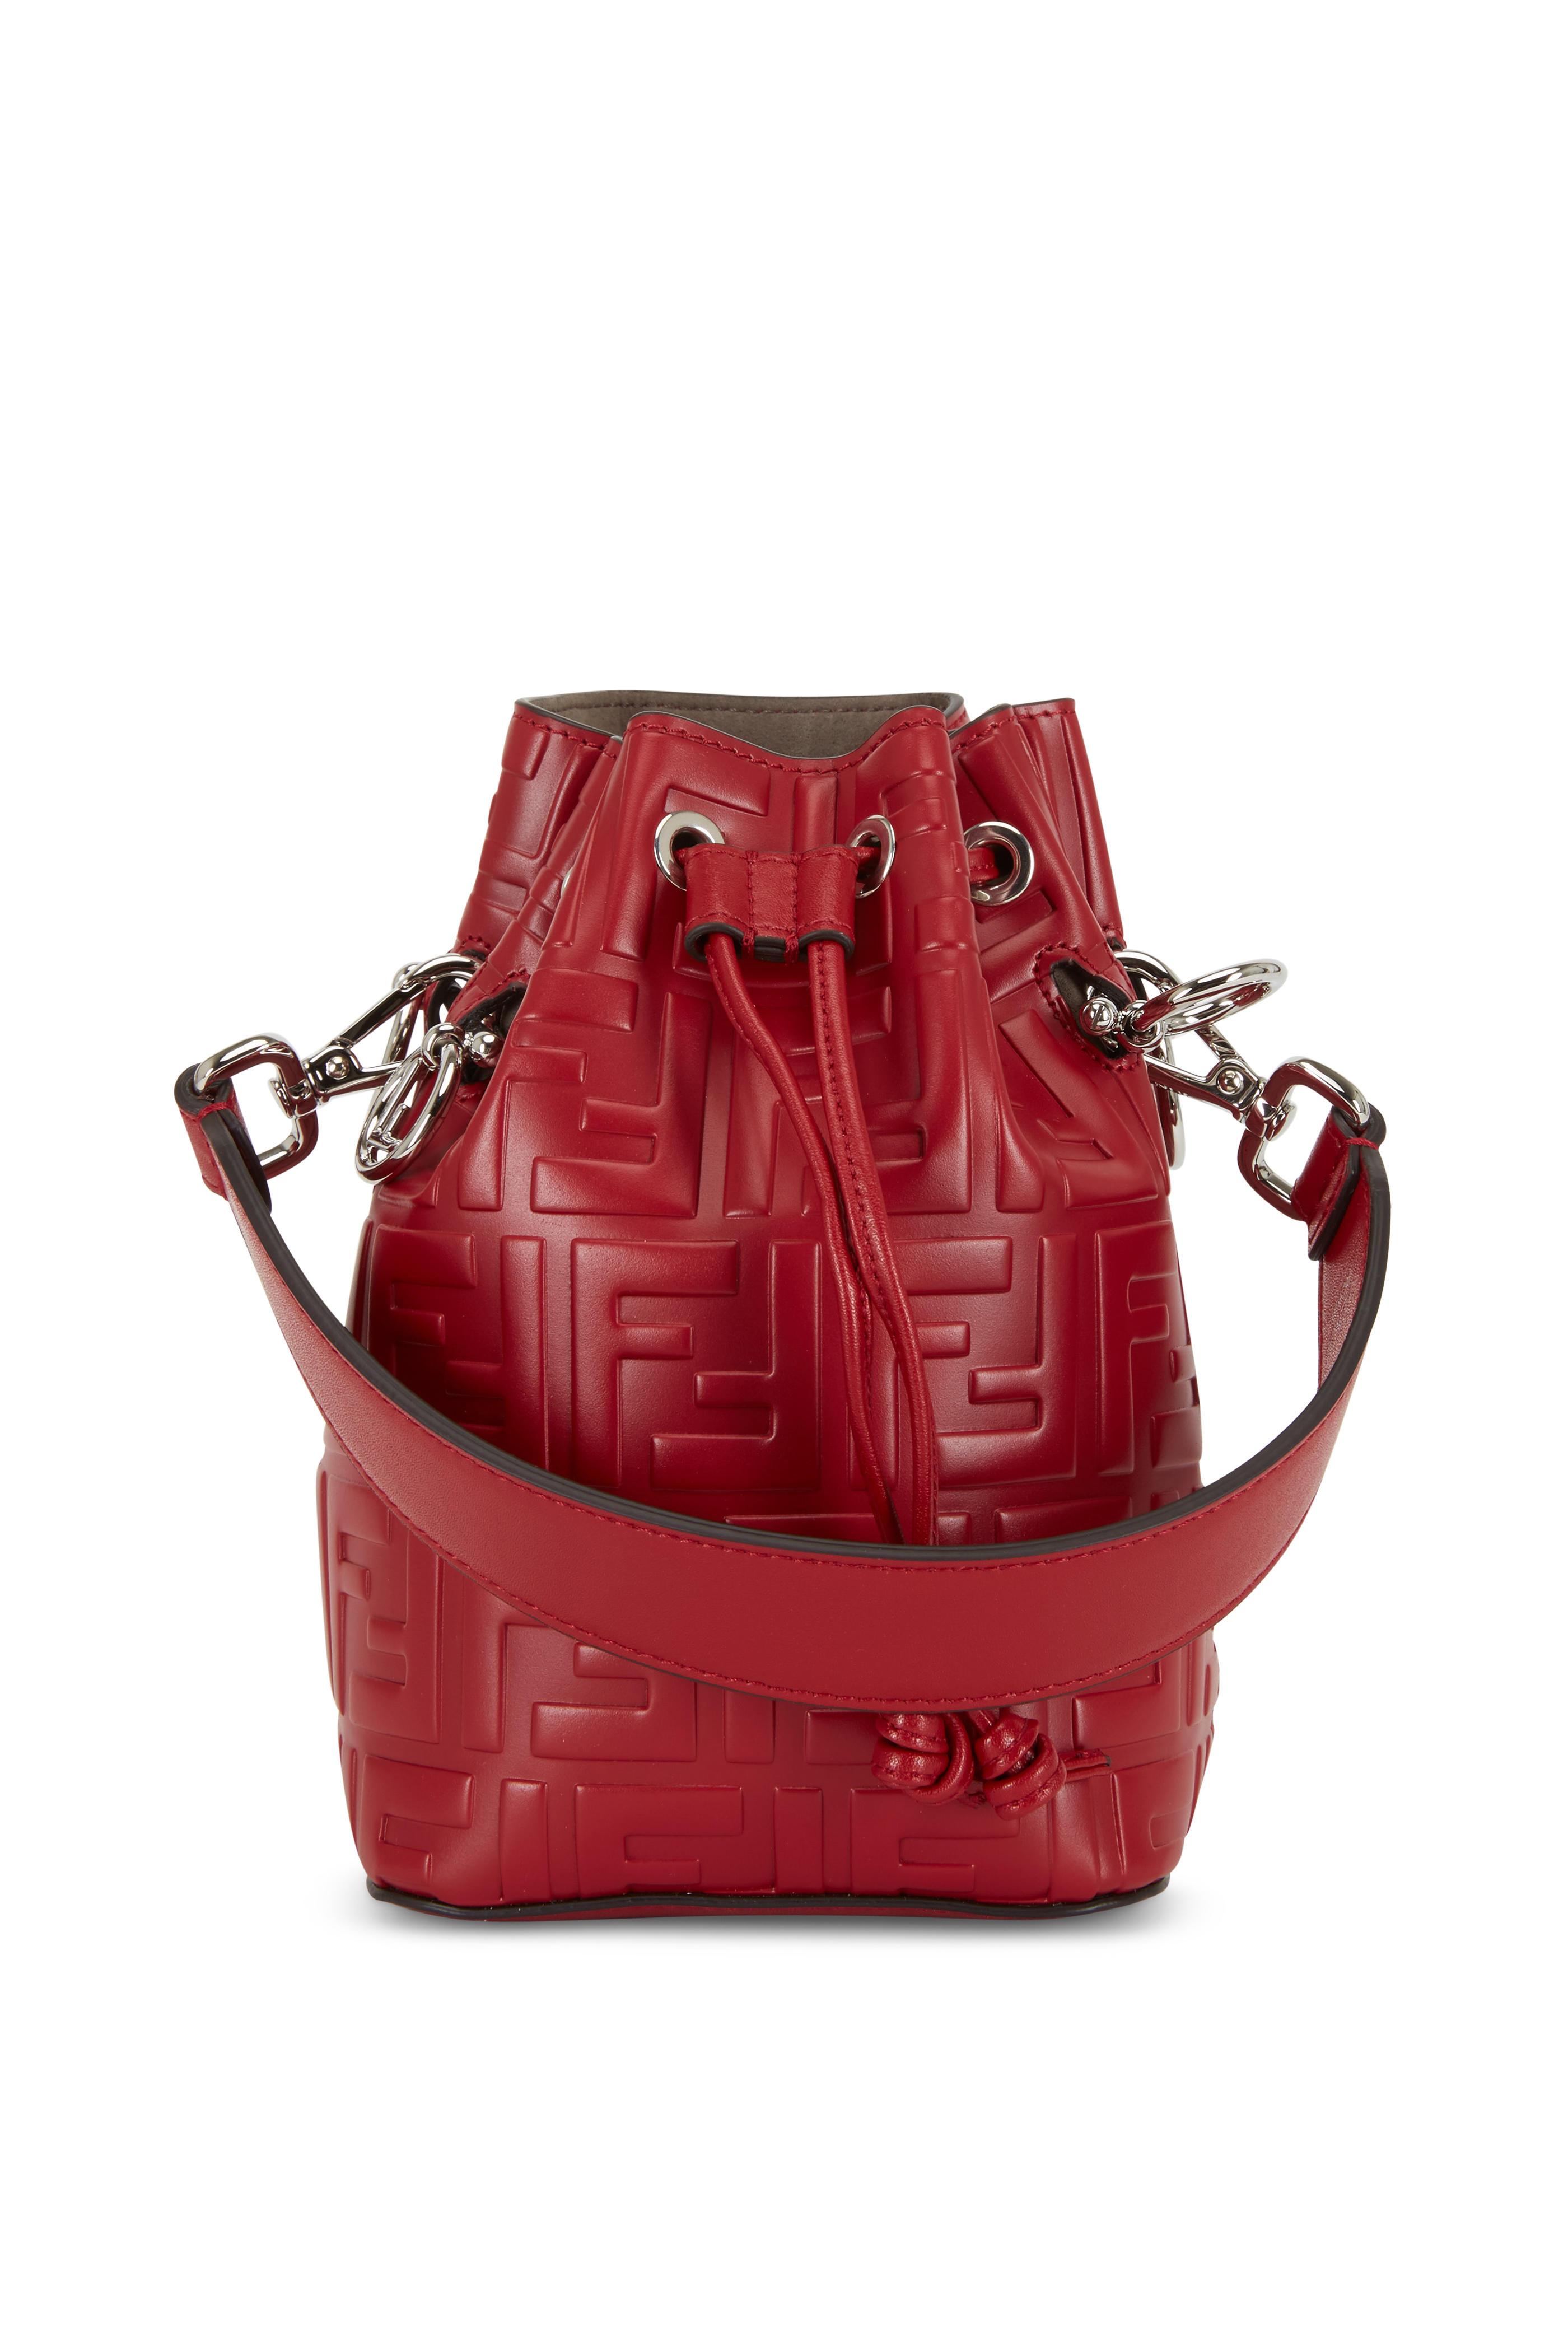 12321aaf6abd Fendi - Mon Tresor Red Logo Embossed Mini Bucket Bag